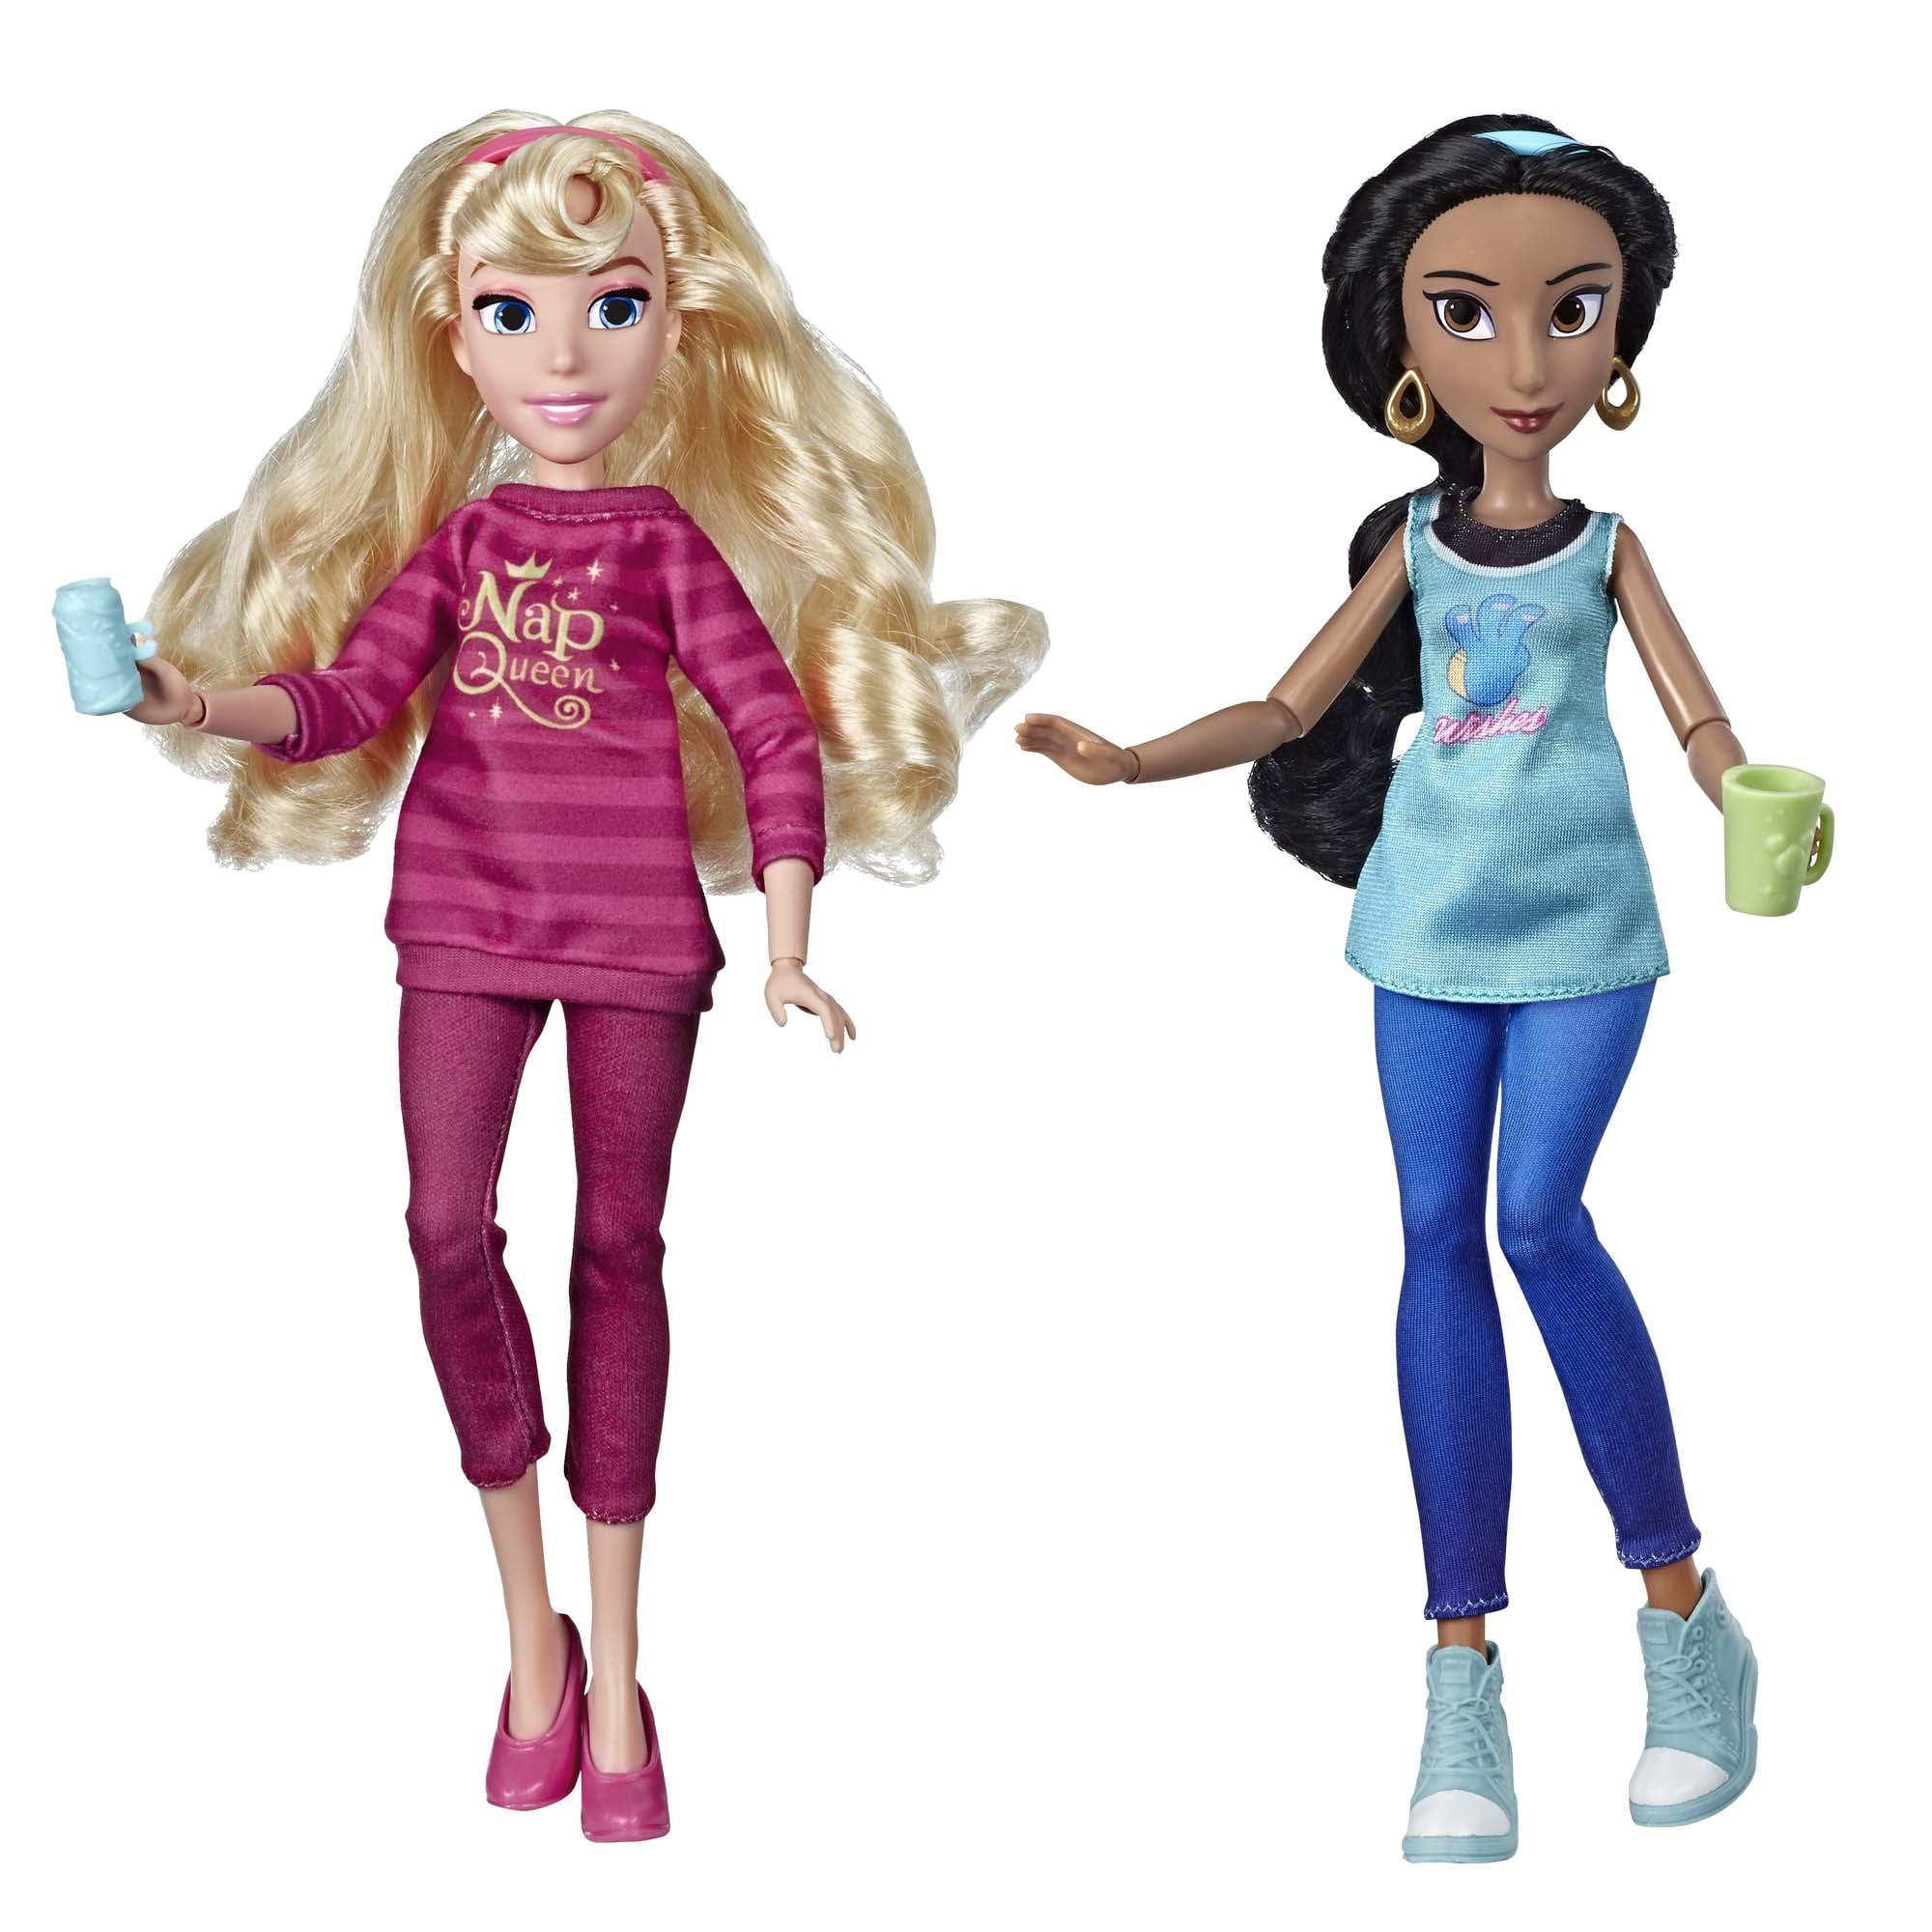 Disney Princess Ralph Breaks The Internet Movie Jasmine And